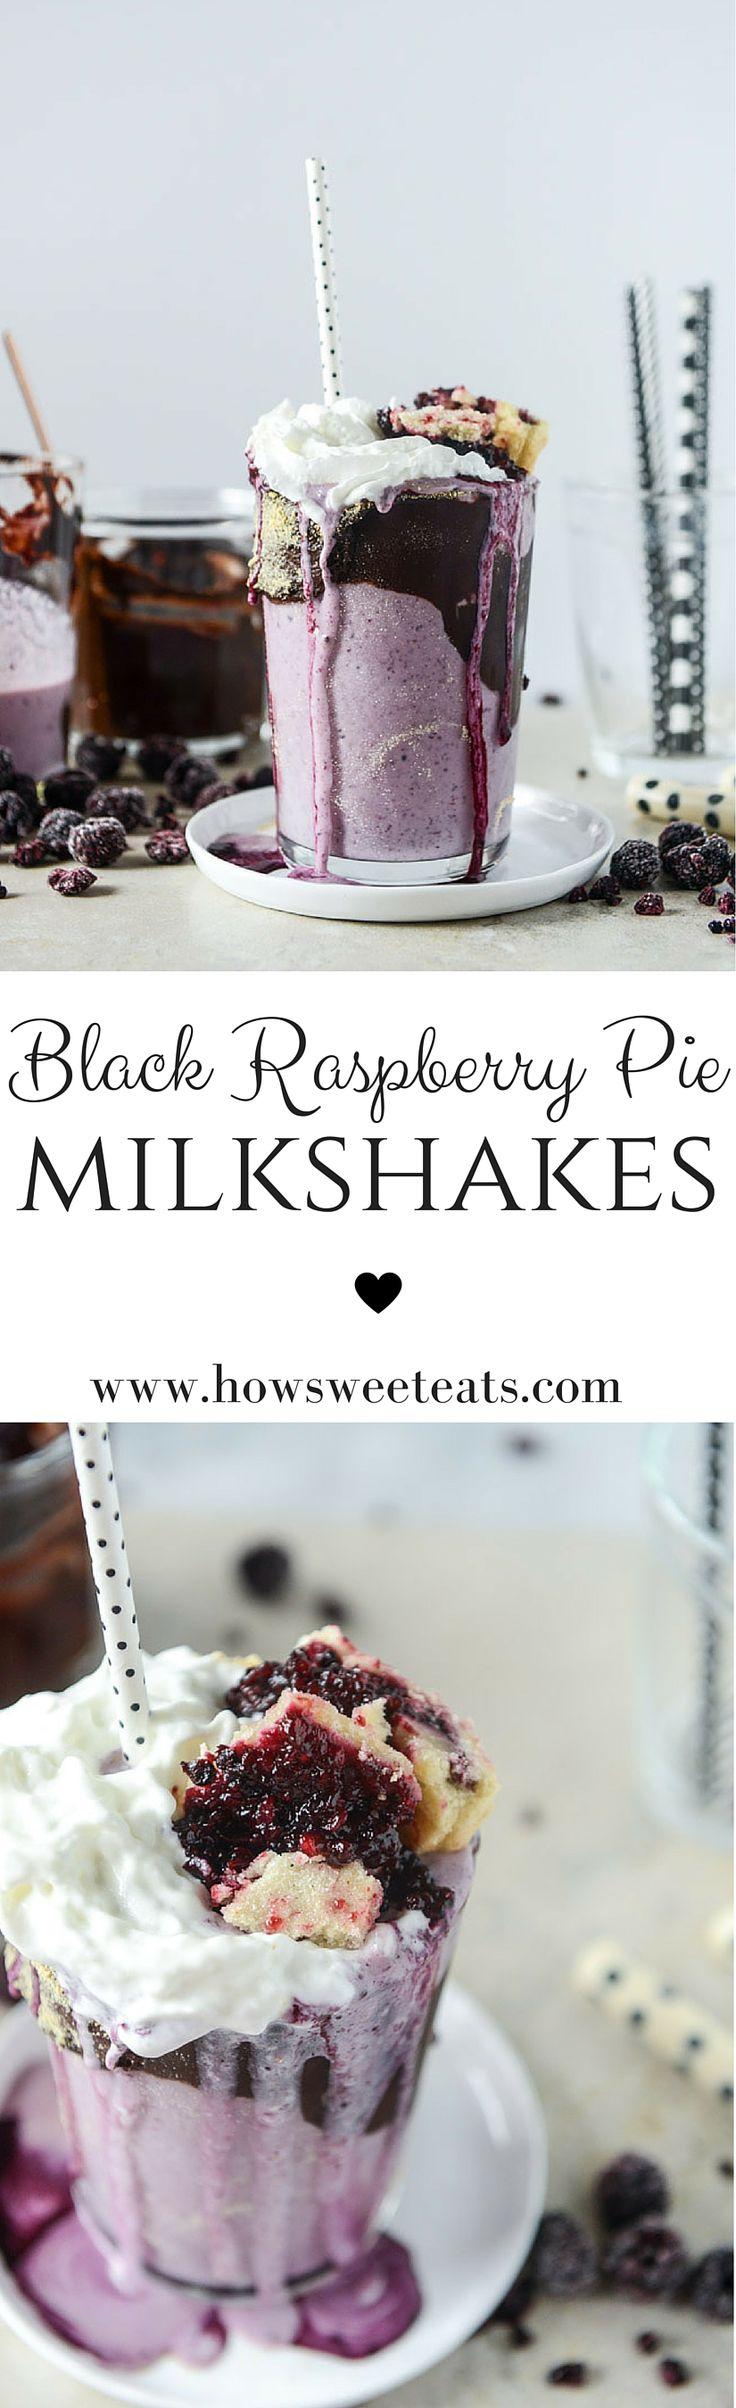 black raspberry pie milkshakes with black raspberry fudge by @howsweeteats I howsweeteats.com